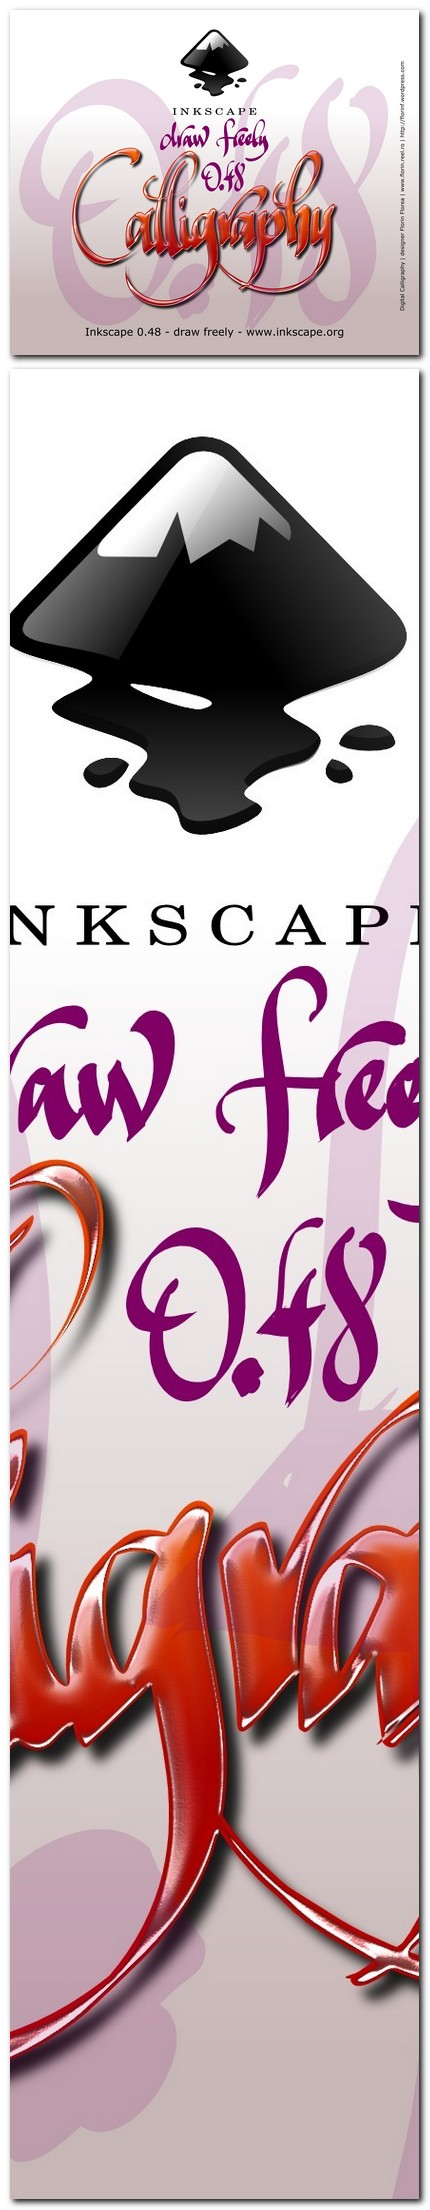 "12 ecran ""About Inkscape"" varianta netrimisa - florinf12 ecran ""About Inkscape"" varianta netrimisa - florinf"